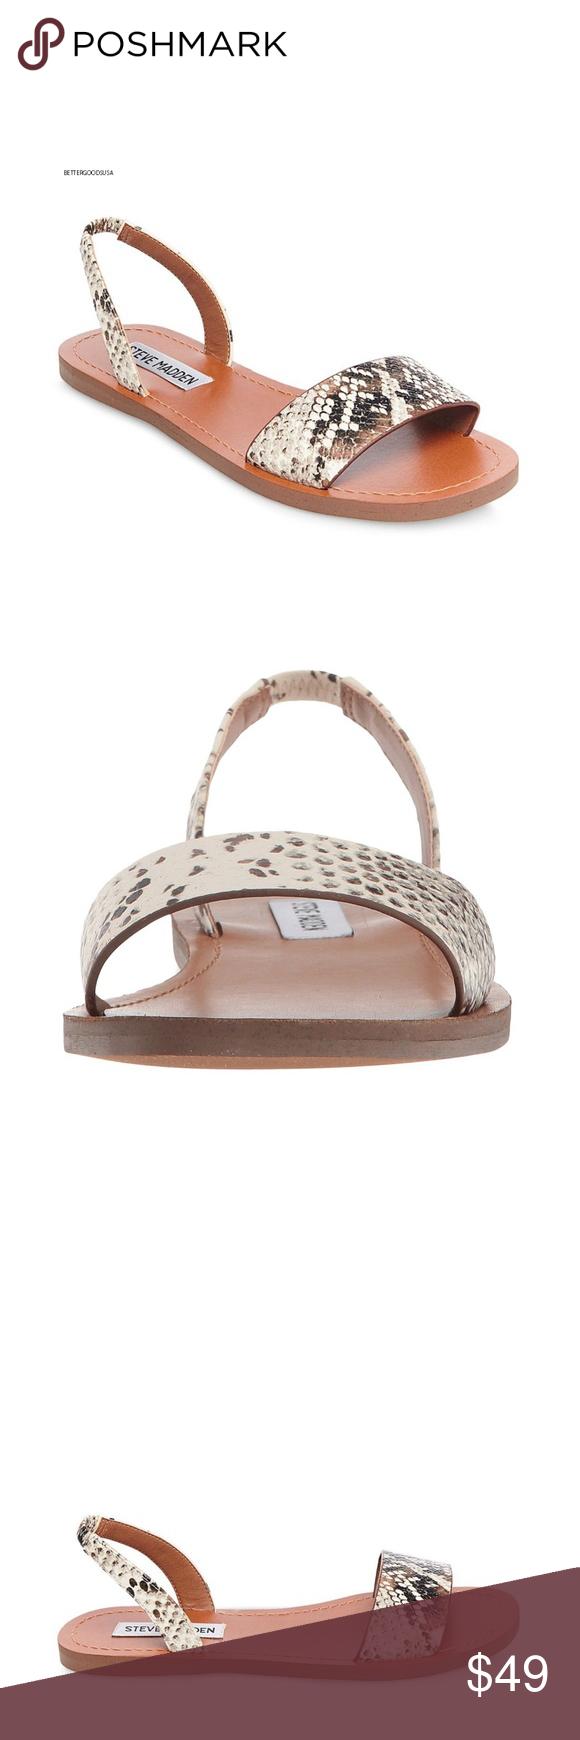 00812926477 Steve Madden Alina Slingback Sandals Snake 6.5 SIZE  USA 6.5 M